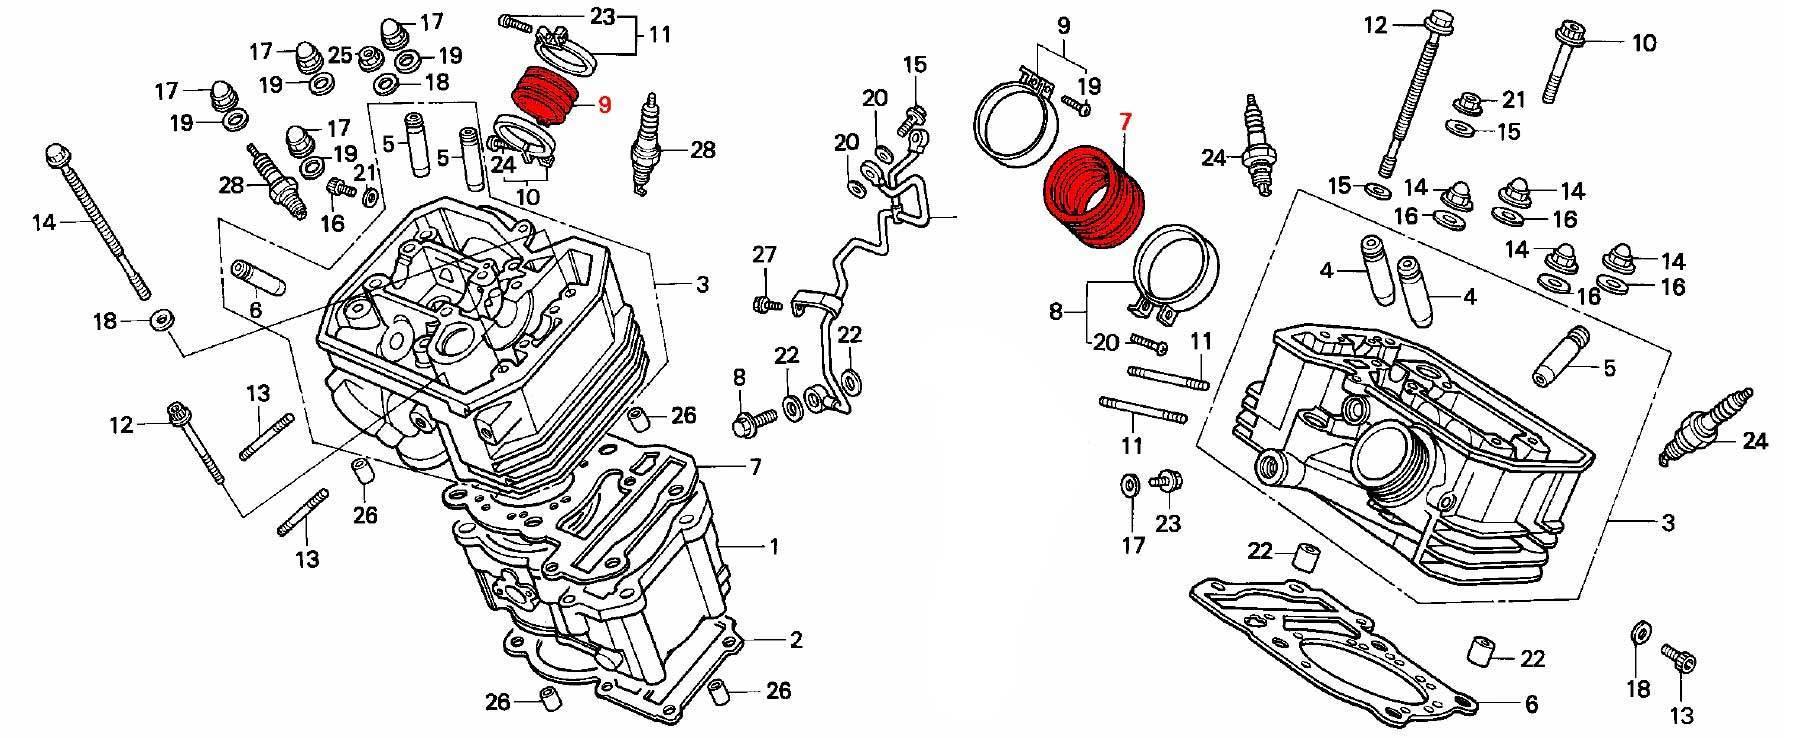 ktm 50 wiring diagram